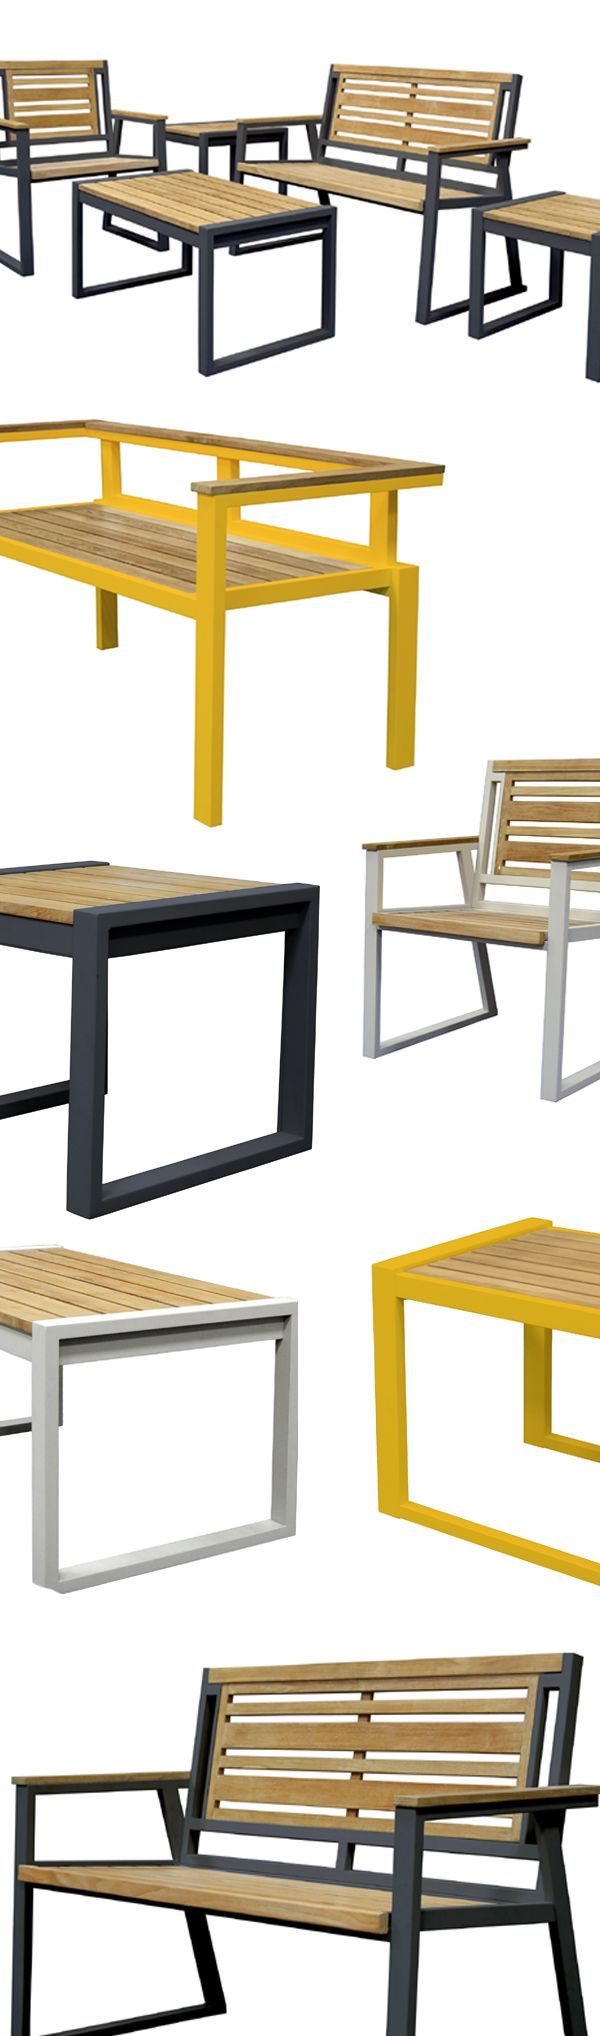 Find Your New Patio Set At Urbilis.com! Our Teak Furniture Line Features A